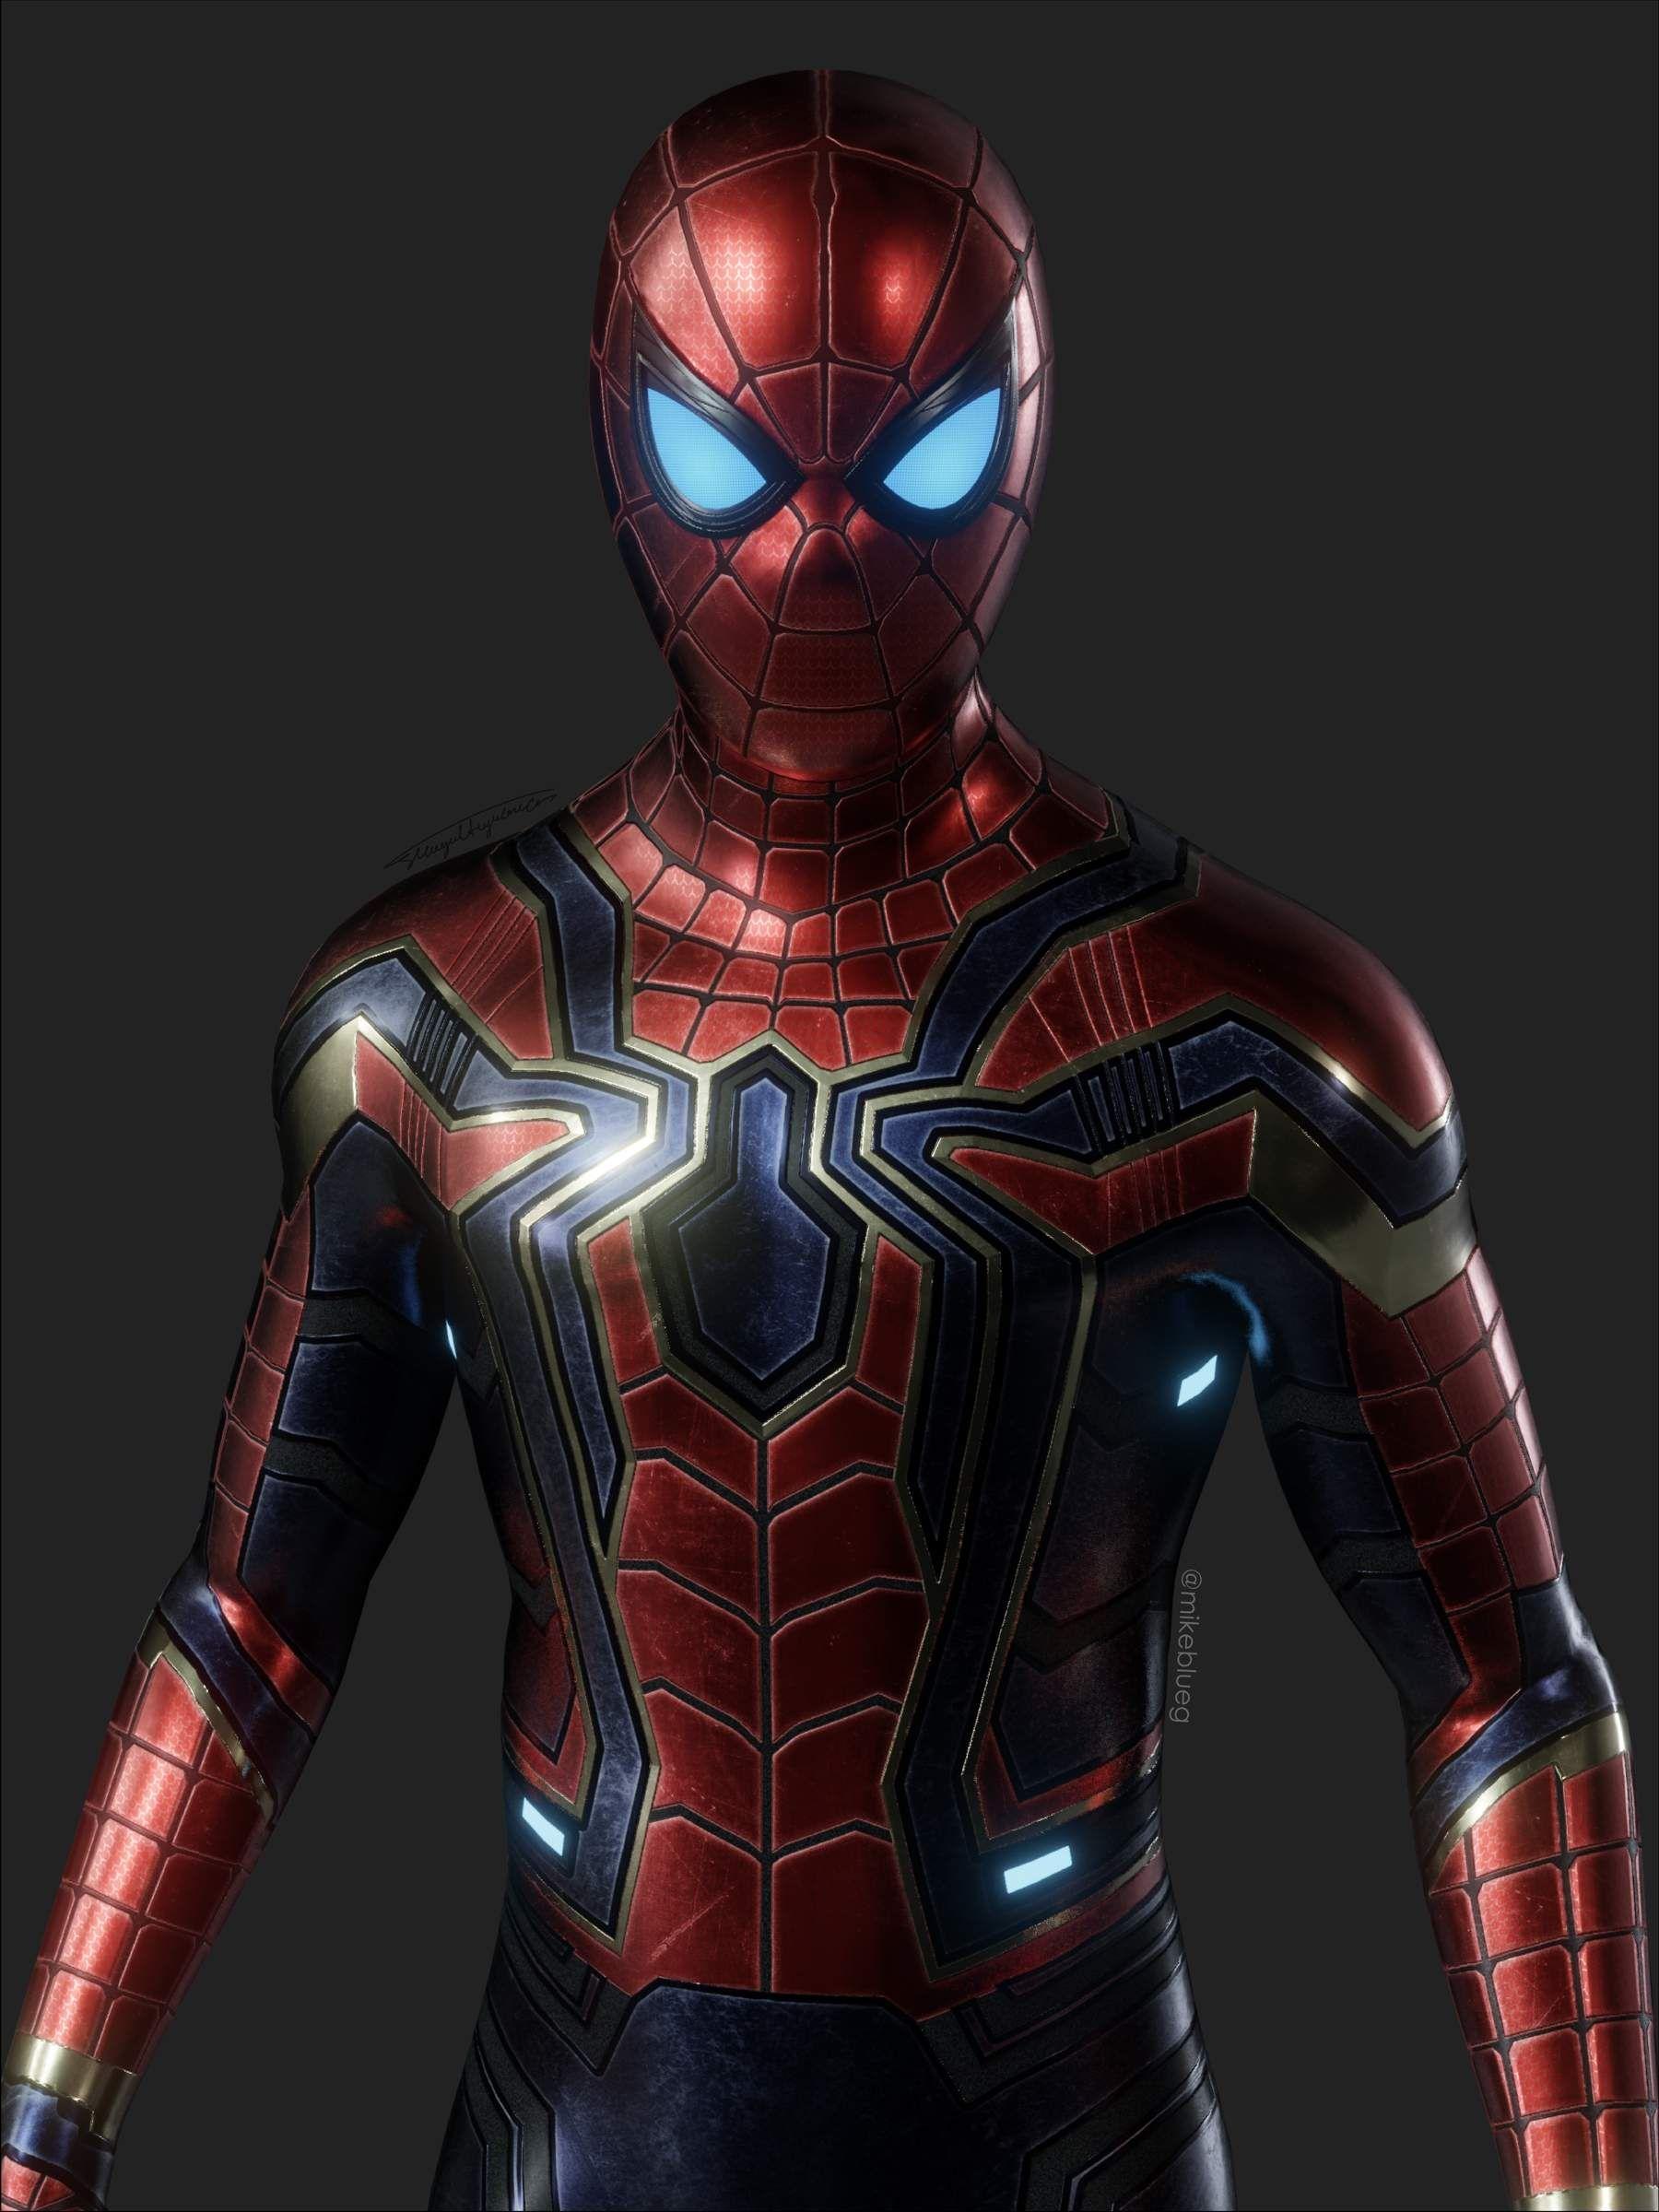 Iron Spider Avengers Suit 3d Model In 2020 Marvel Comics Wallpaper Iron Spider Avengers